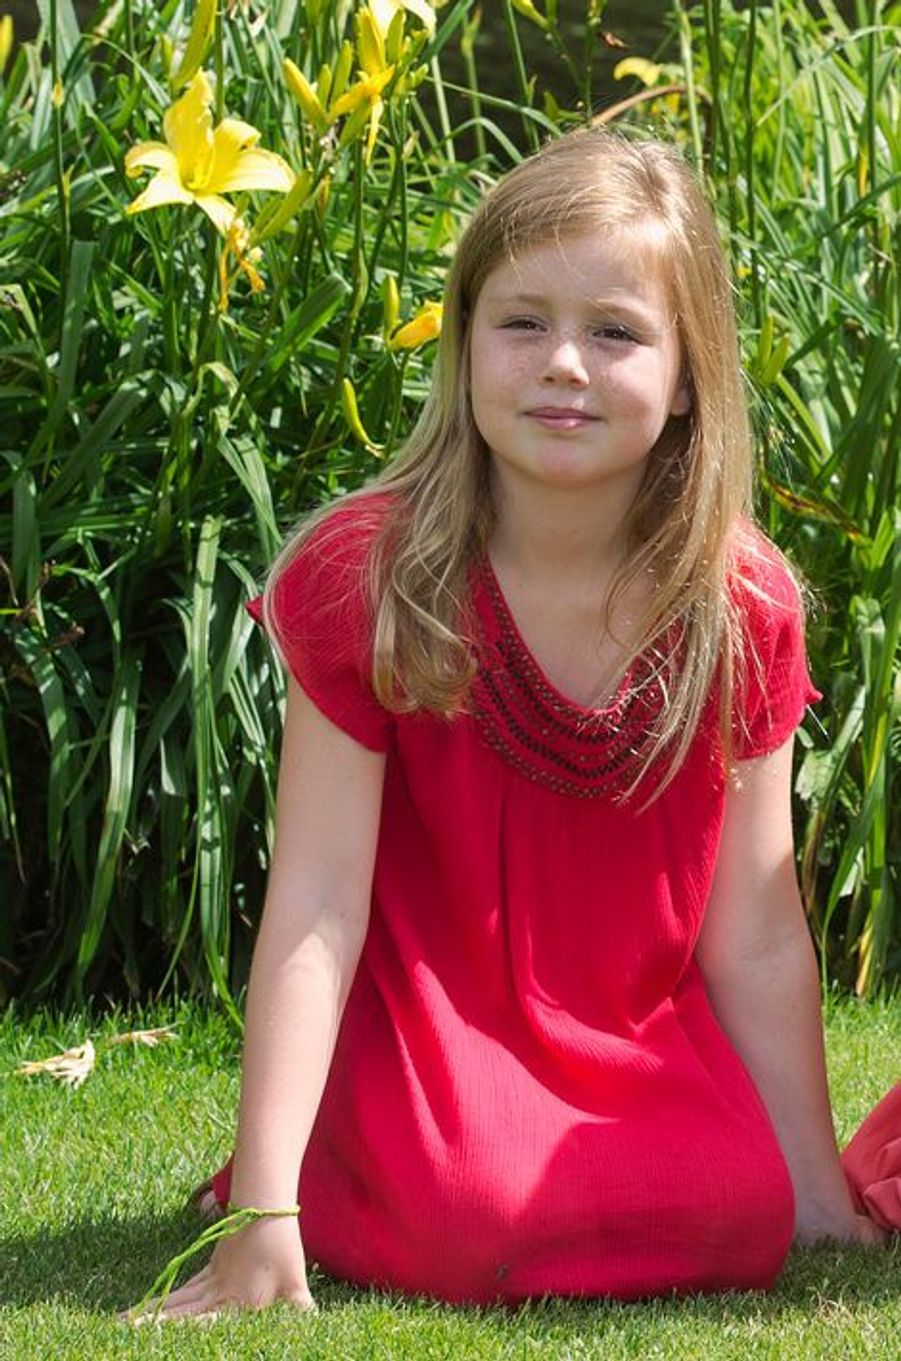 La princesse Alexia, le 19 juillet 2013